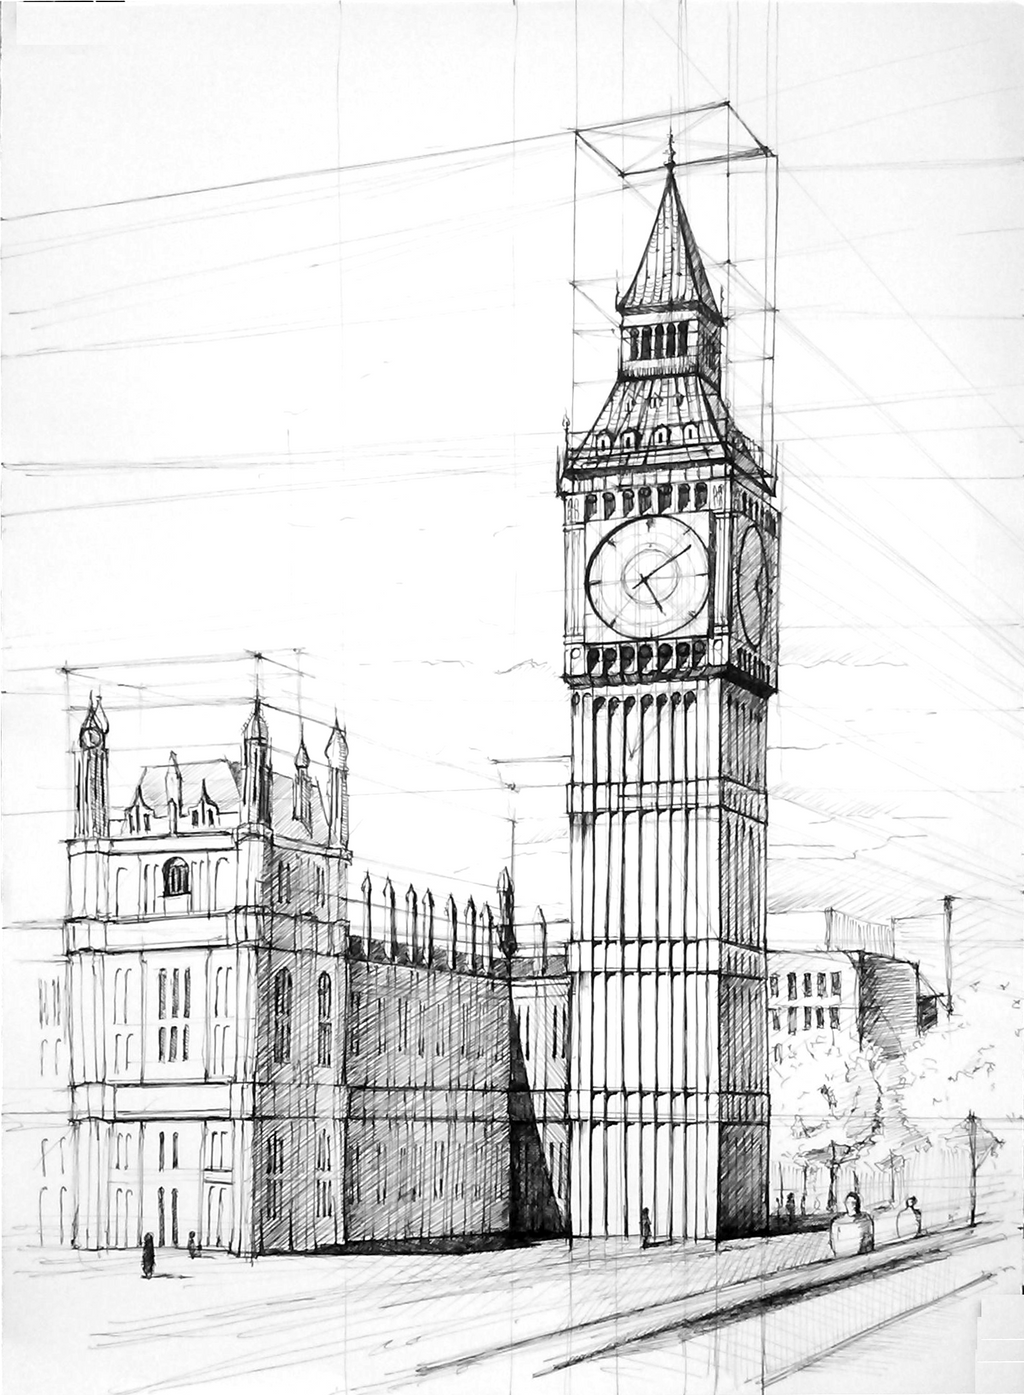 Картинки биг бена в лондоне карандашом